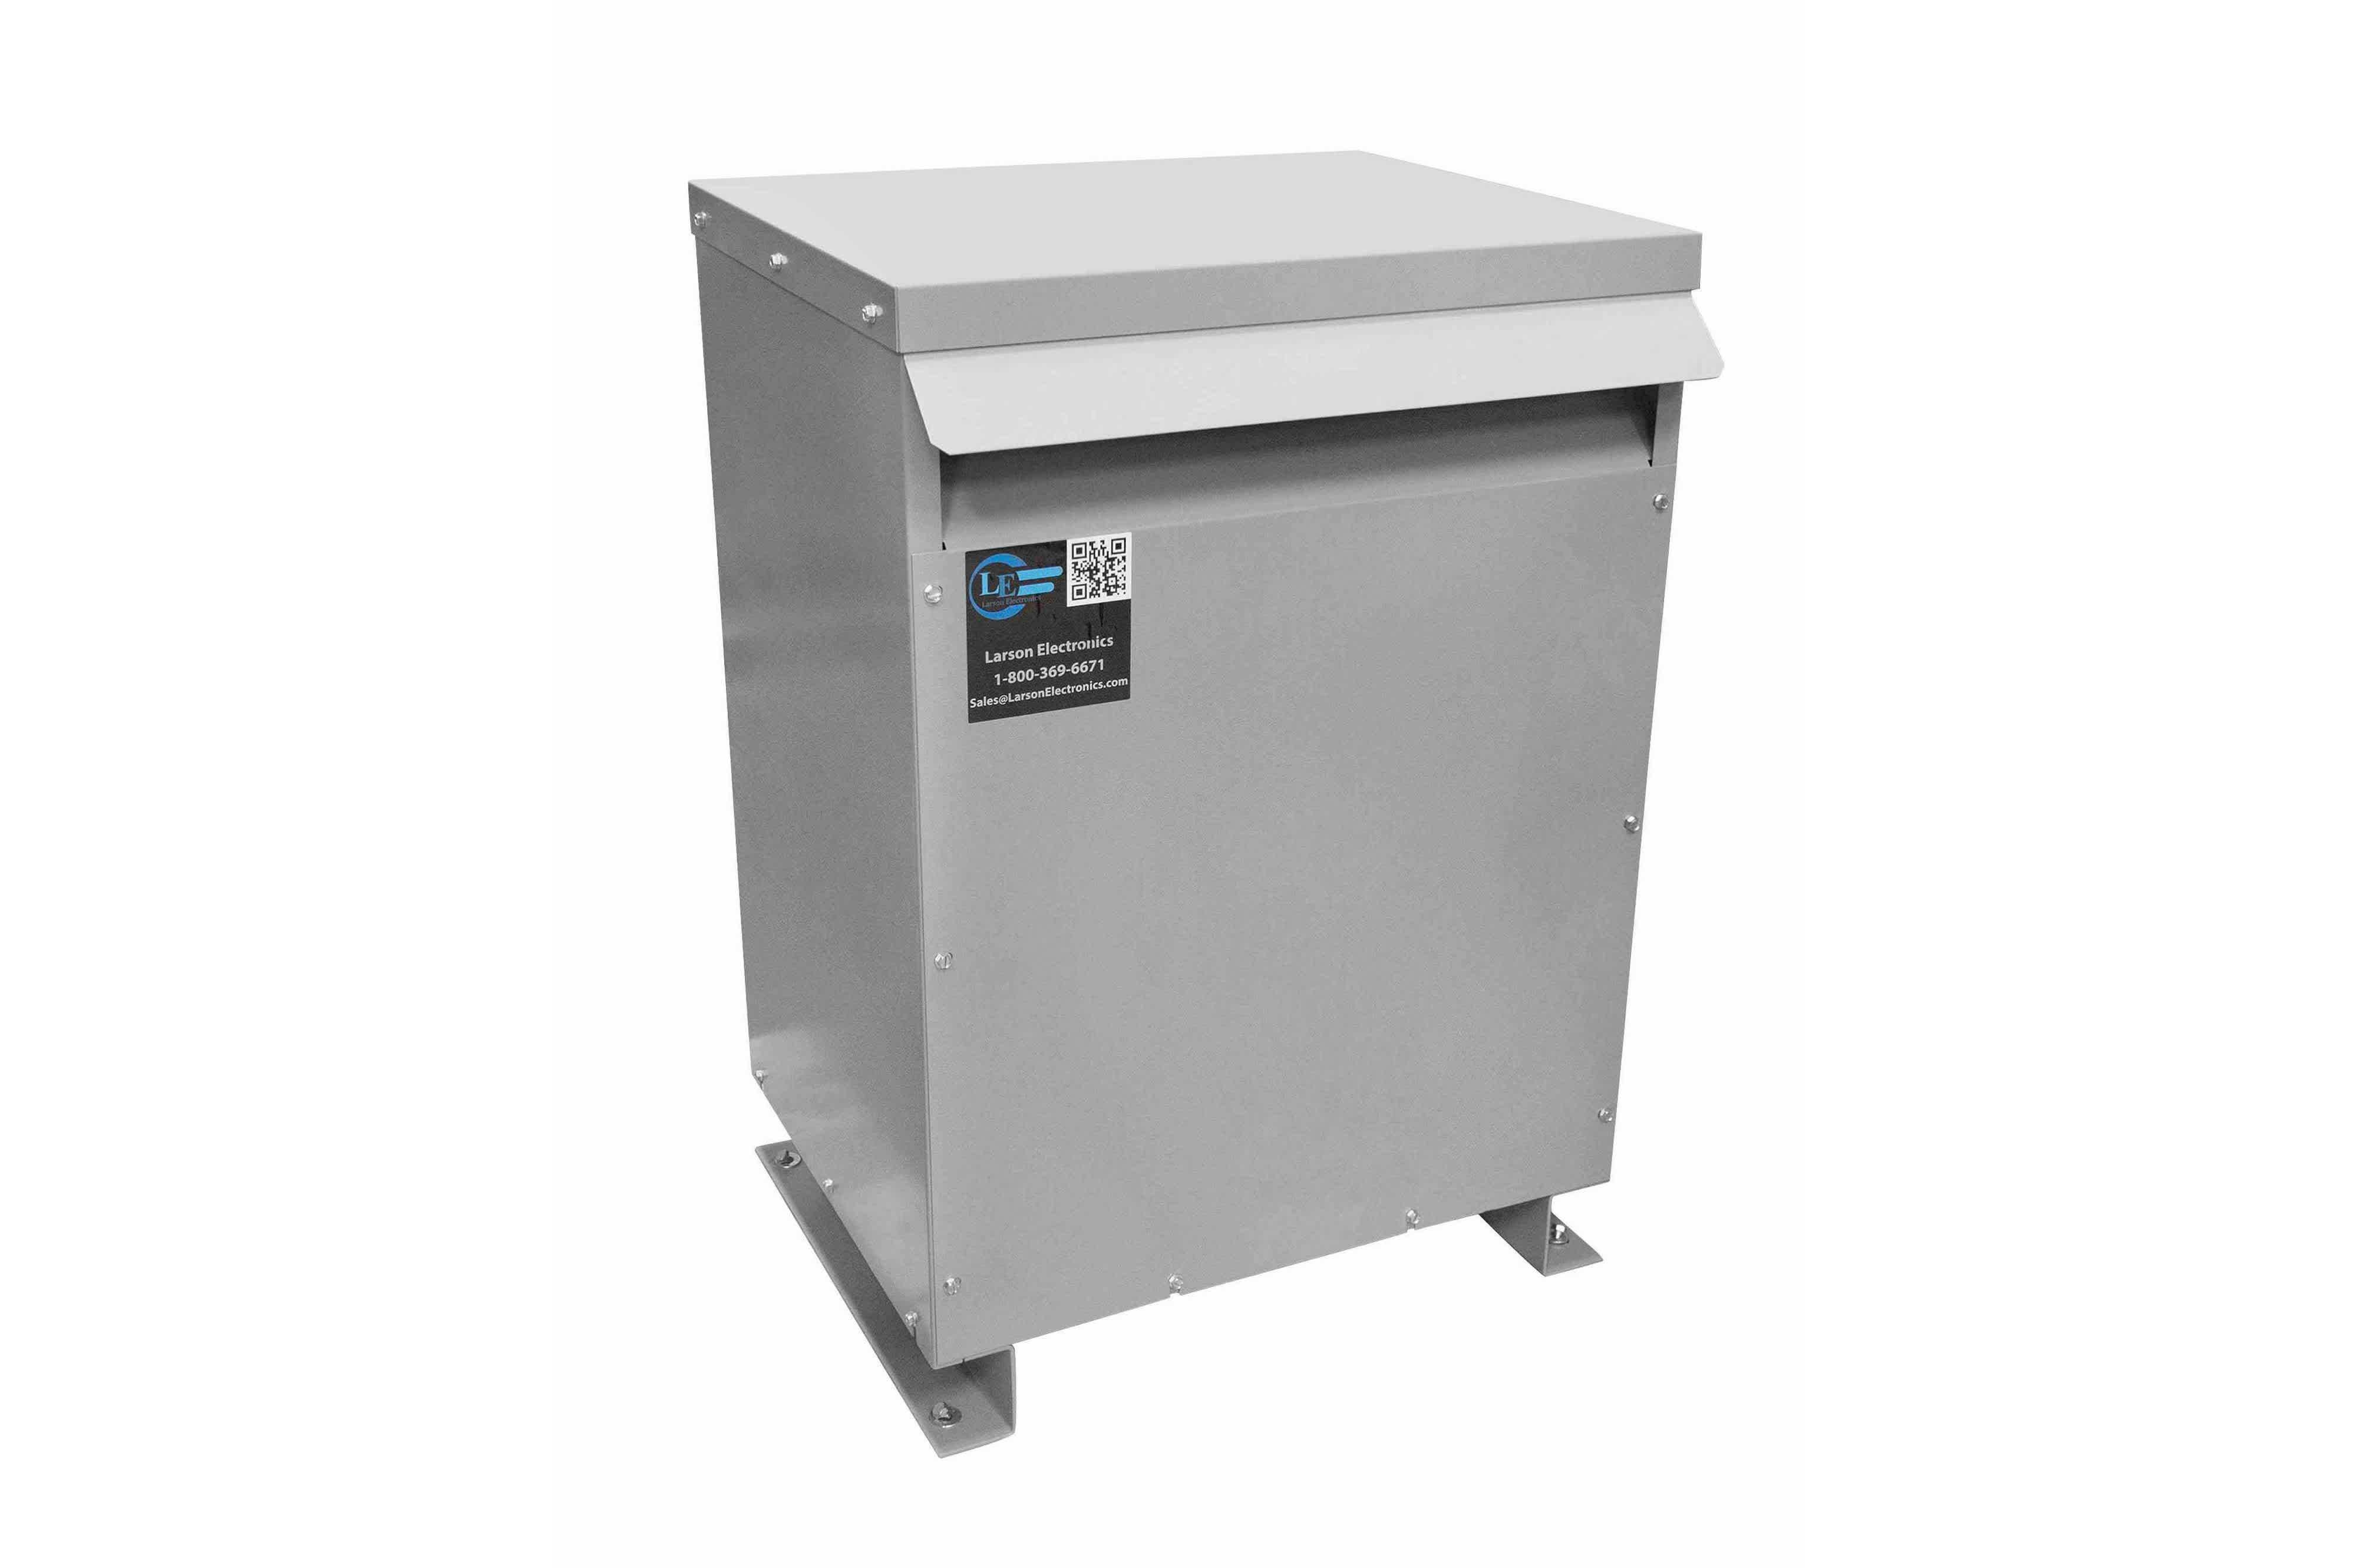 30 kVA 3PH Isolation Transformer, 208V Wye Primary, 415V Delta Secondary, N3R, Ventilated, 60 Hz